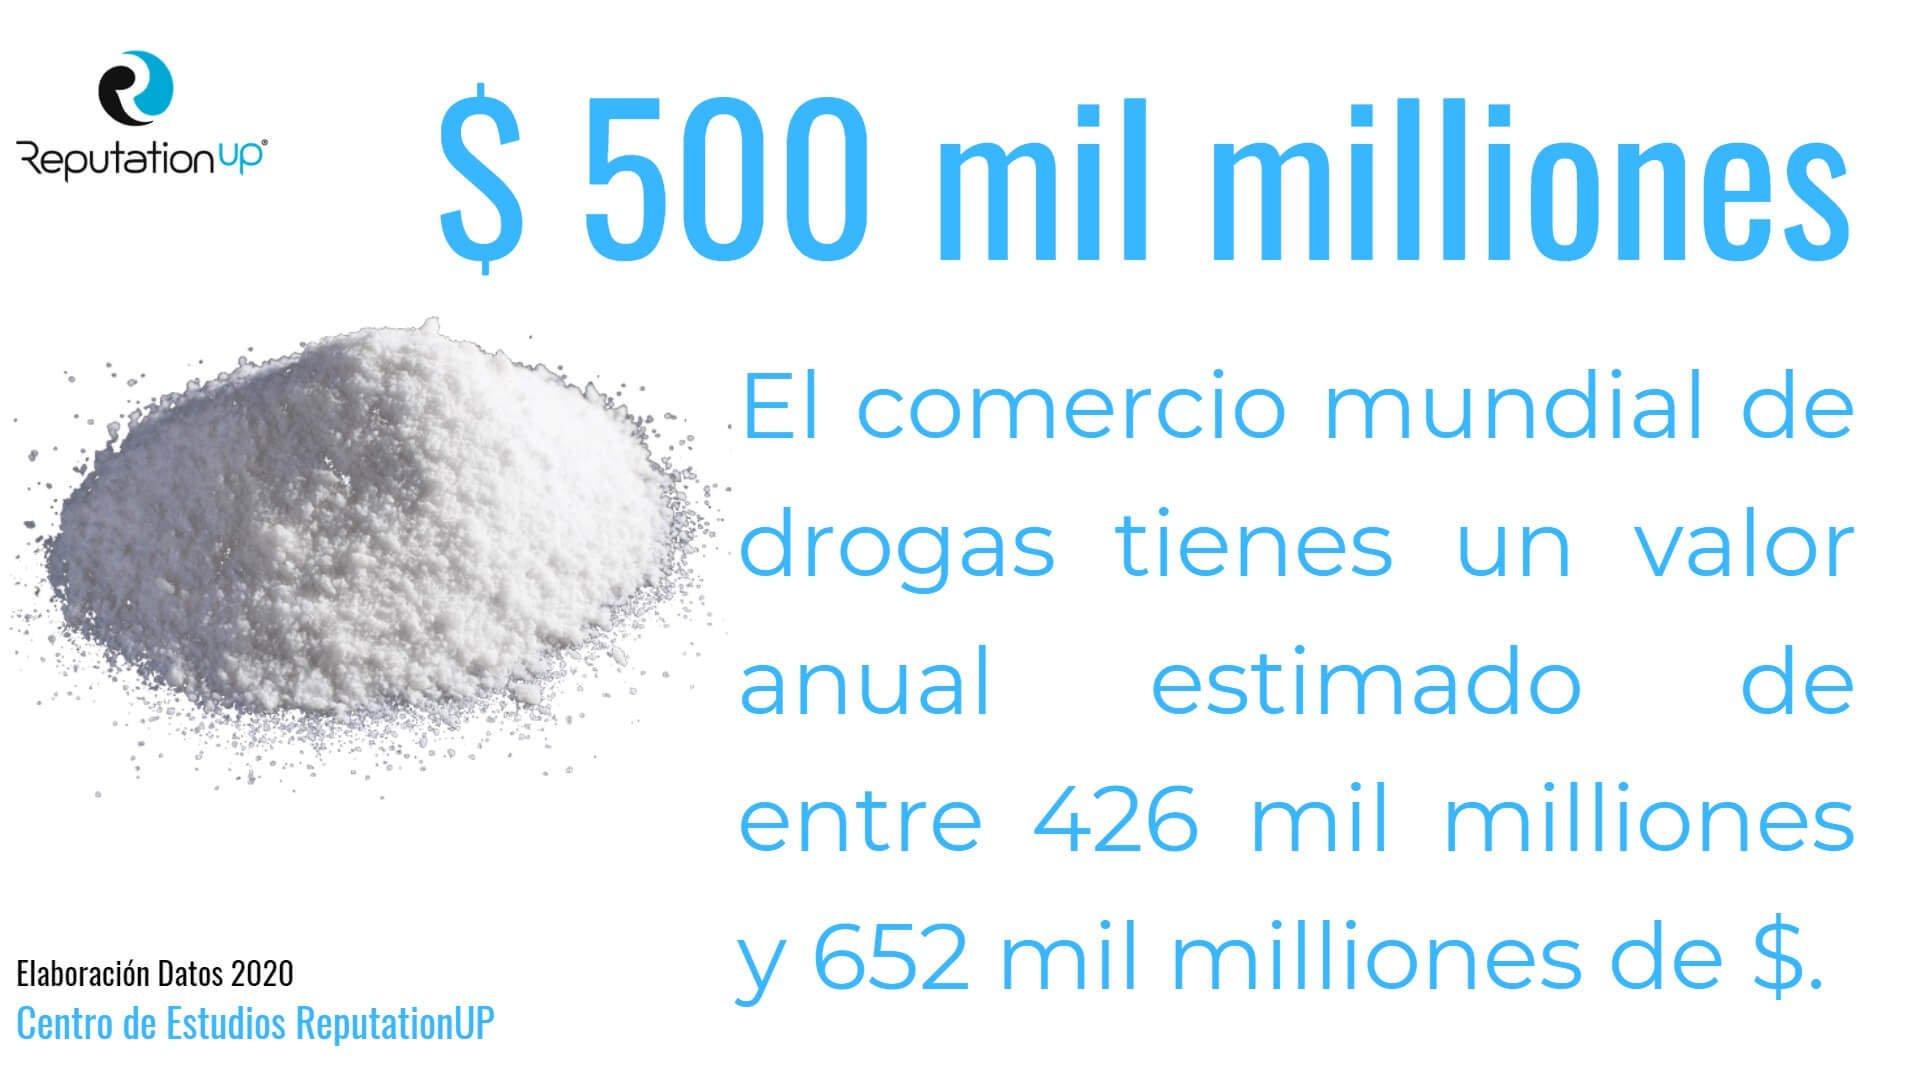 valor anual comercio mundial de drogas centro estudios reputationup world check